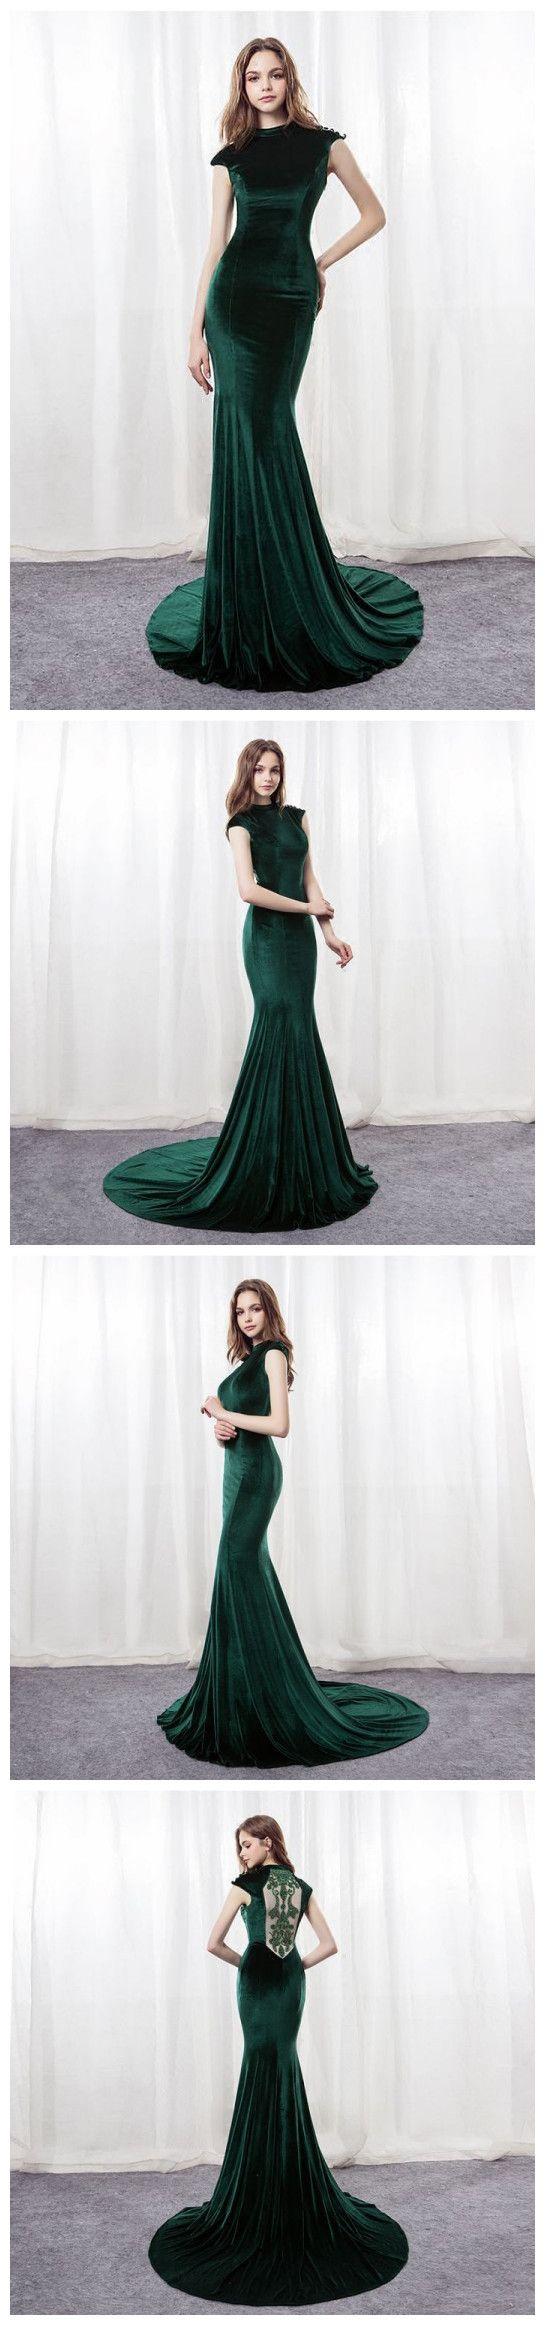 Mermaid prom dresses dark green sweepbrush train scoop long prom